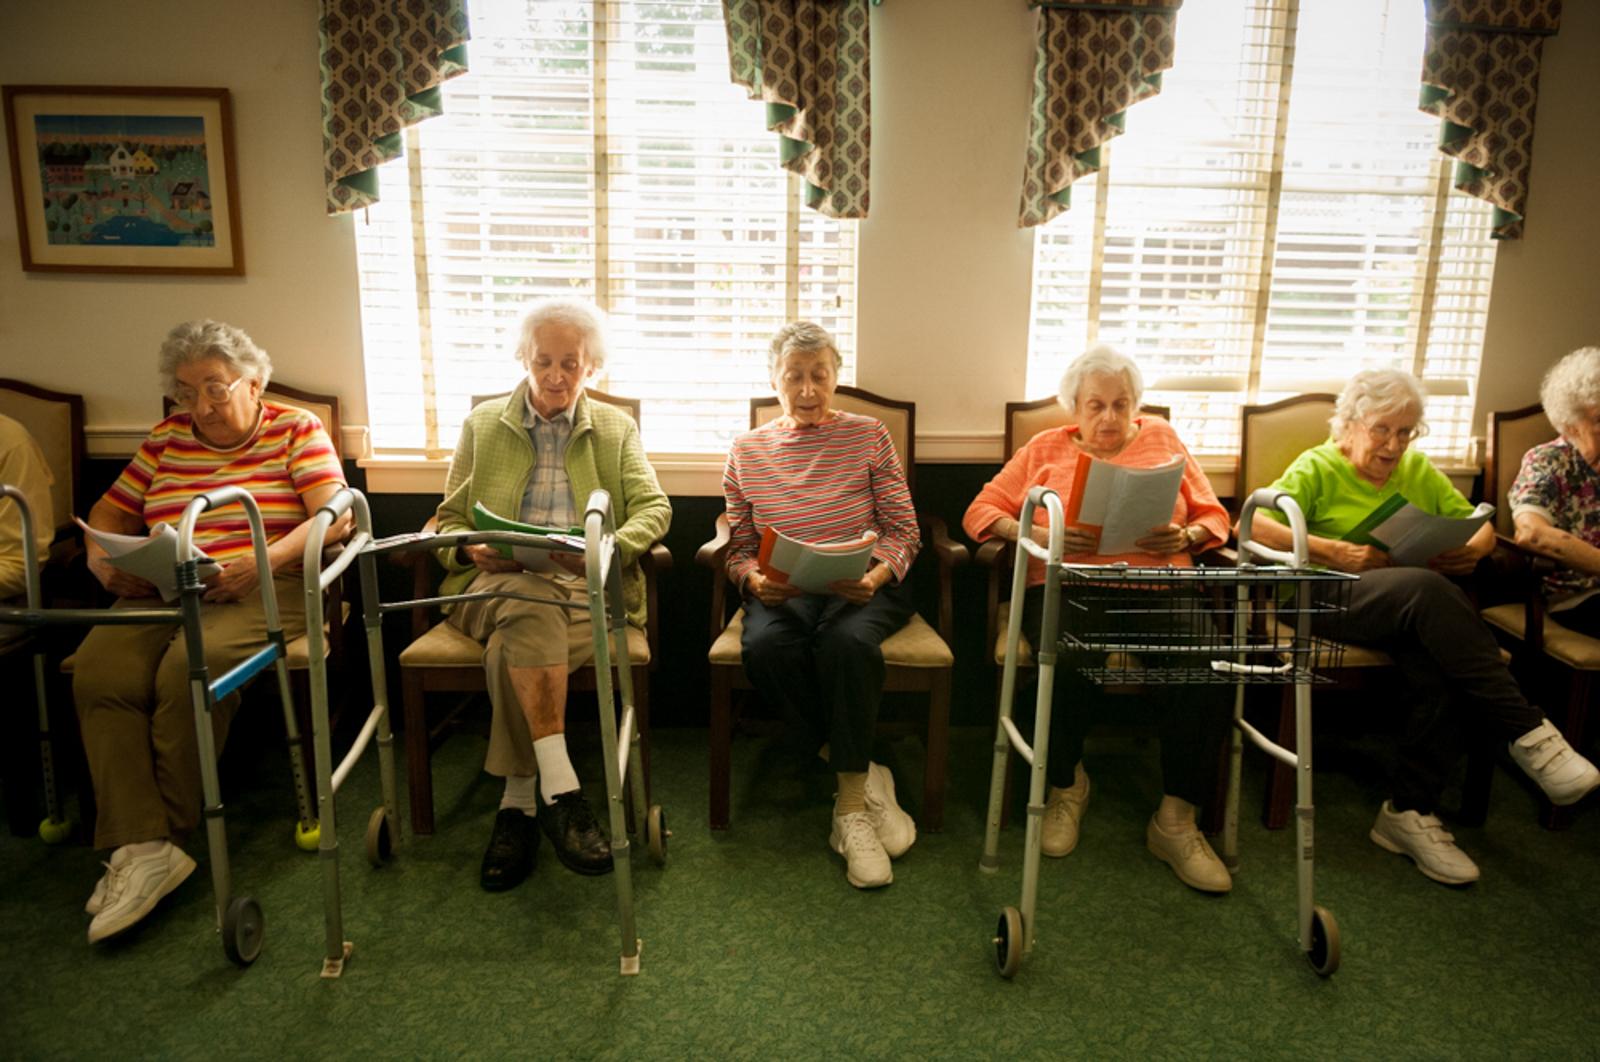 Group of elderly women sitting in cozy room, reading